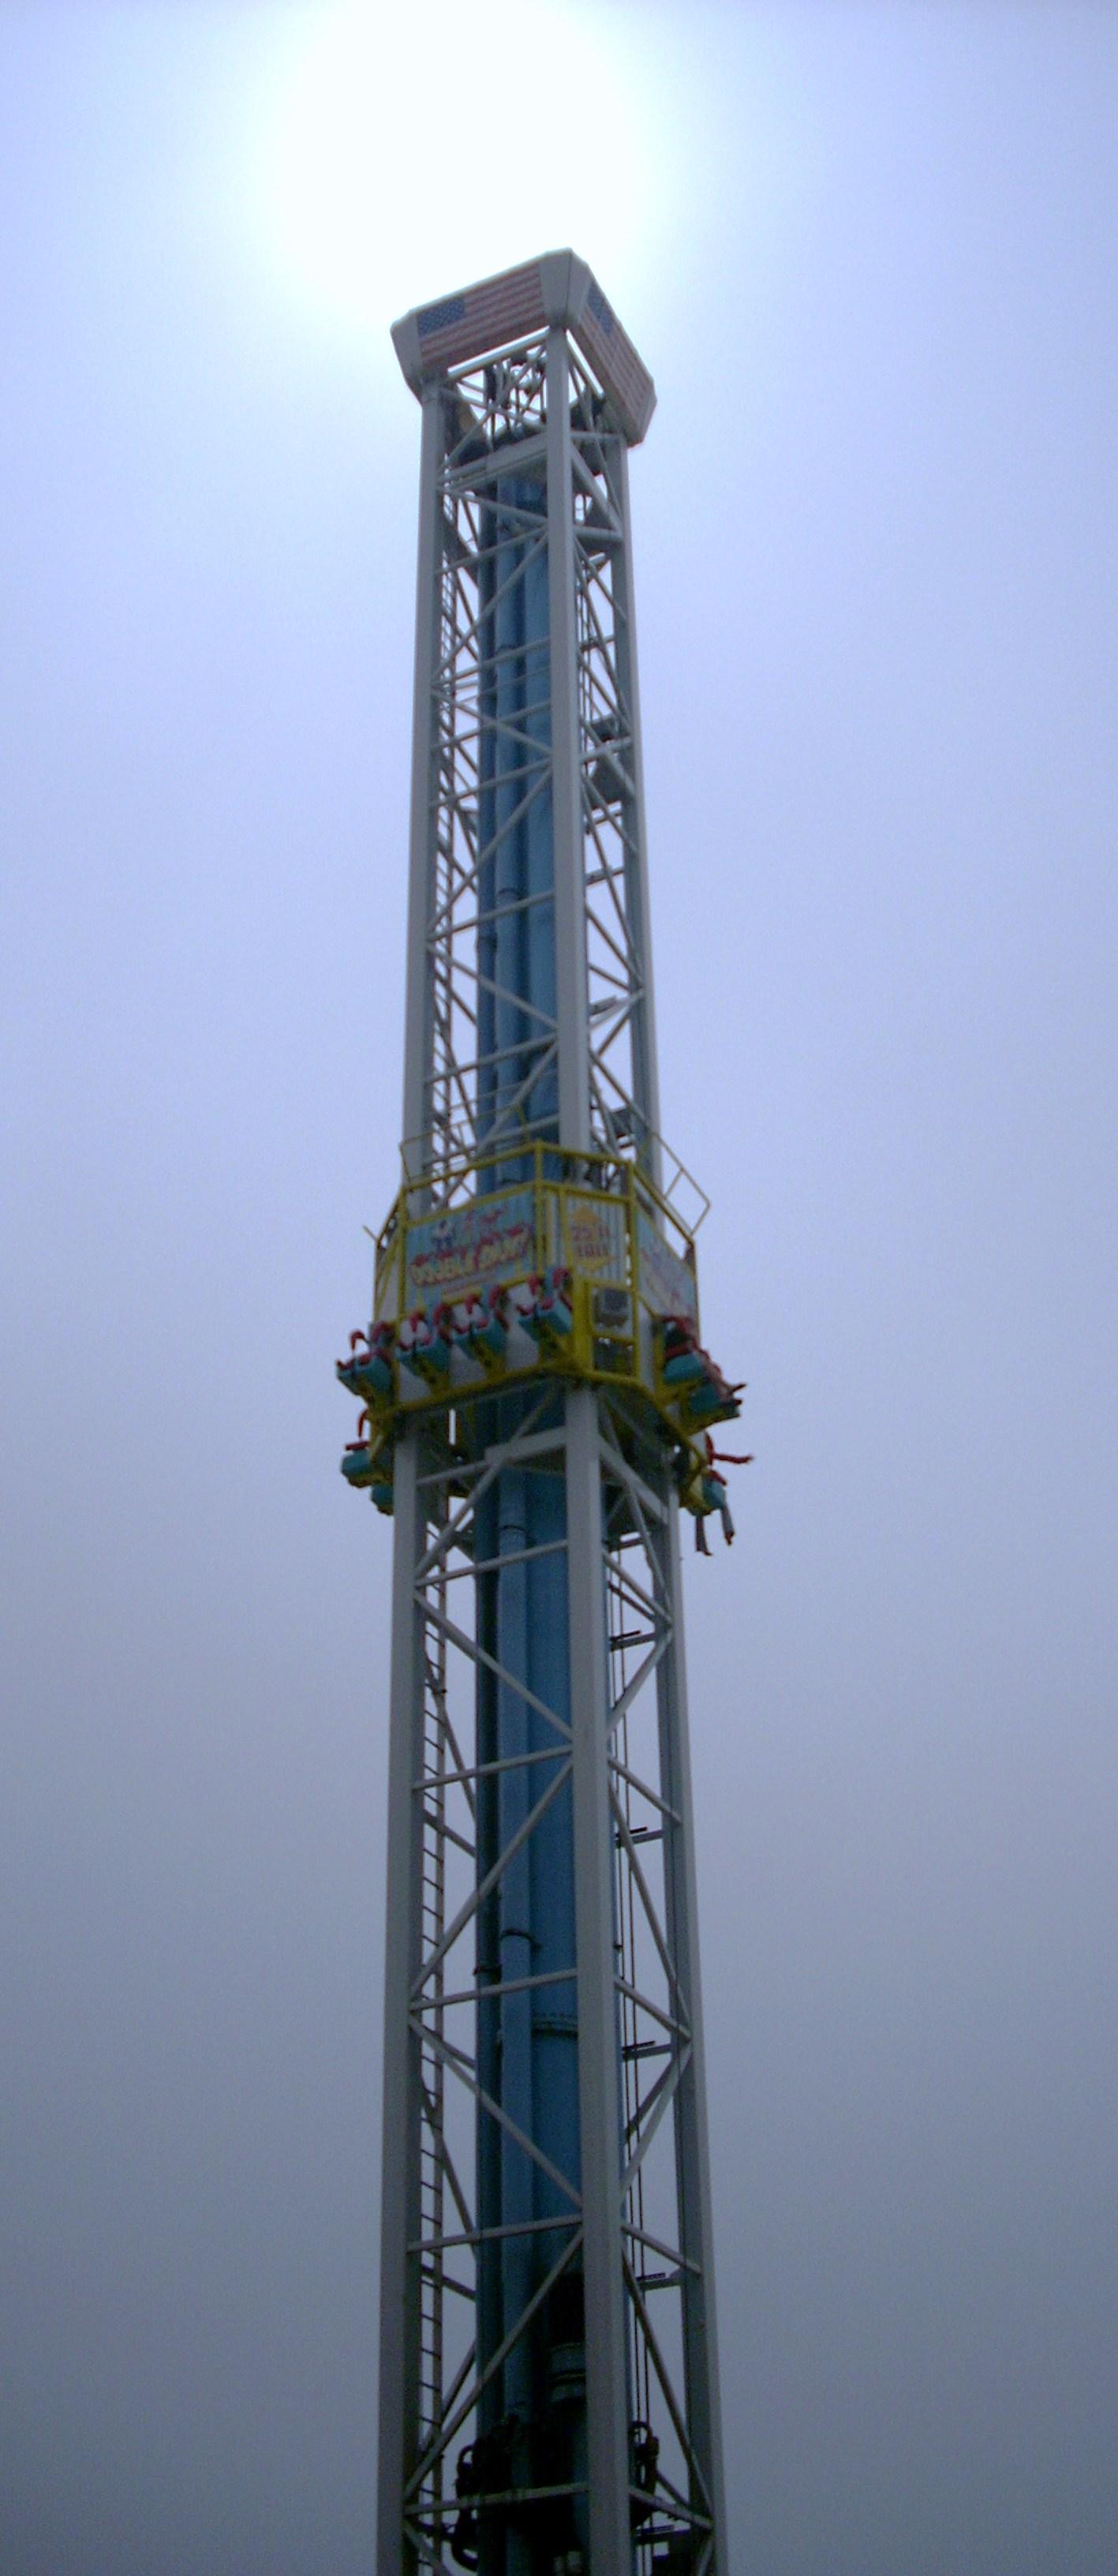 File:Drop tower Santa cruz boardwalk.JPG